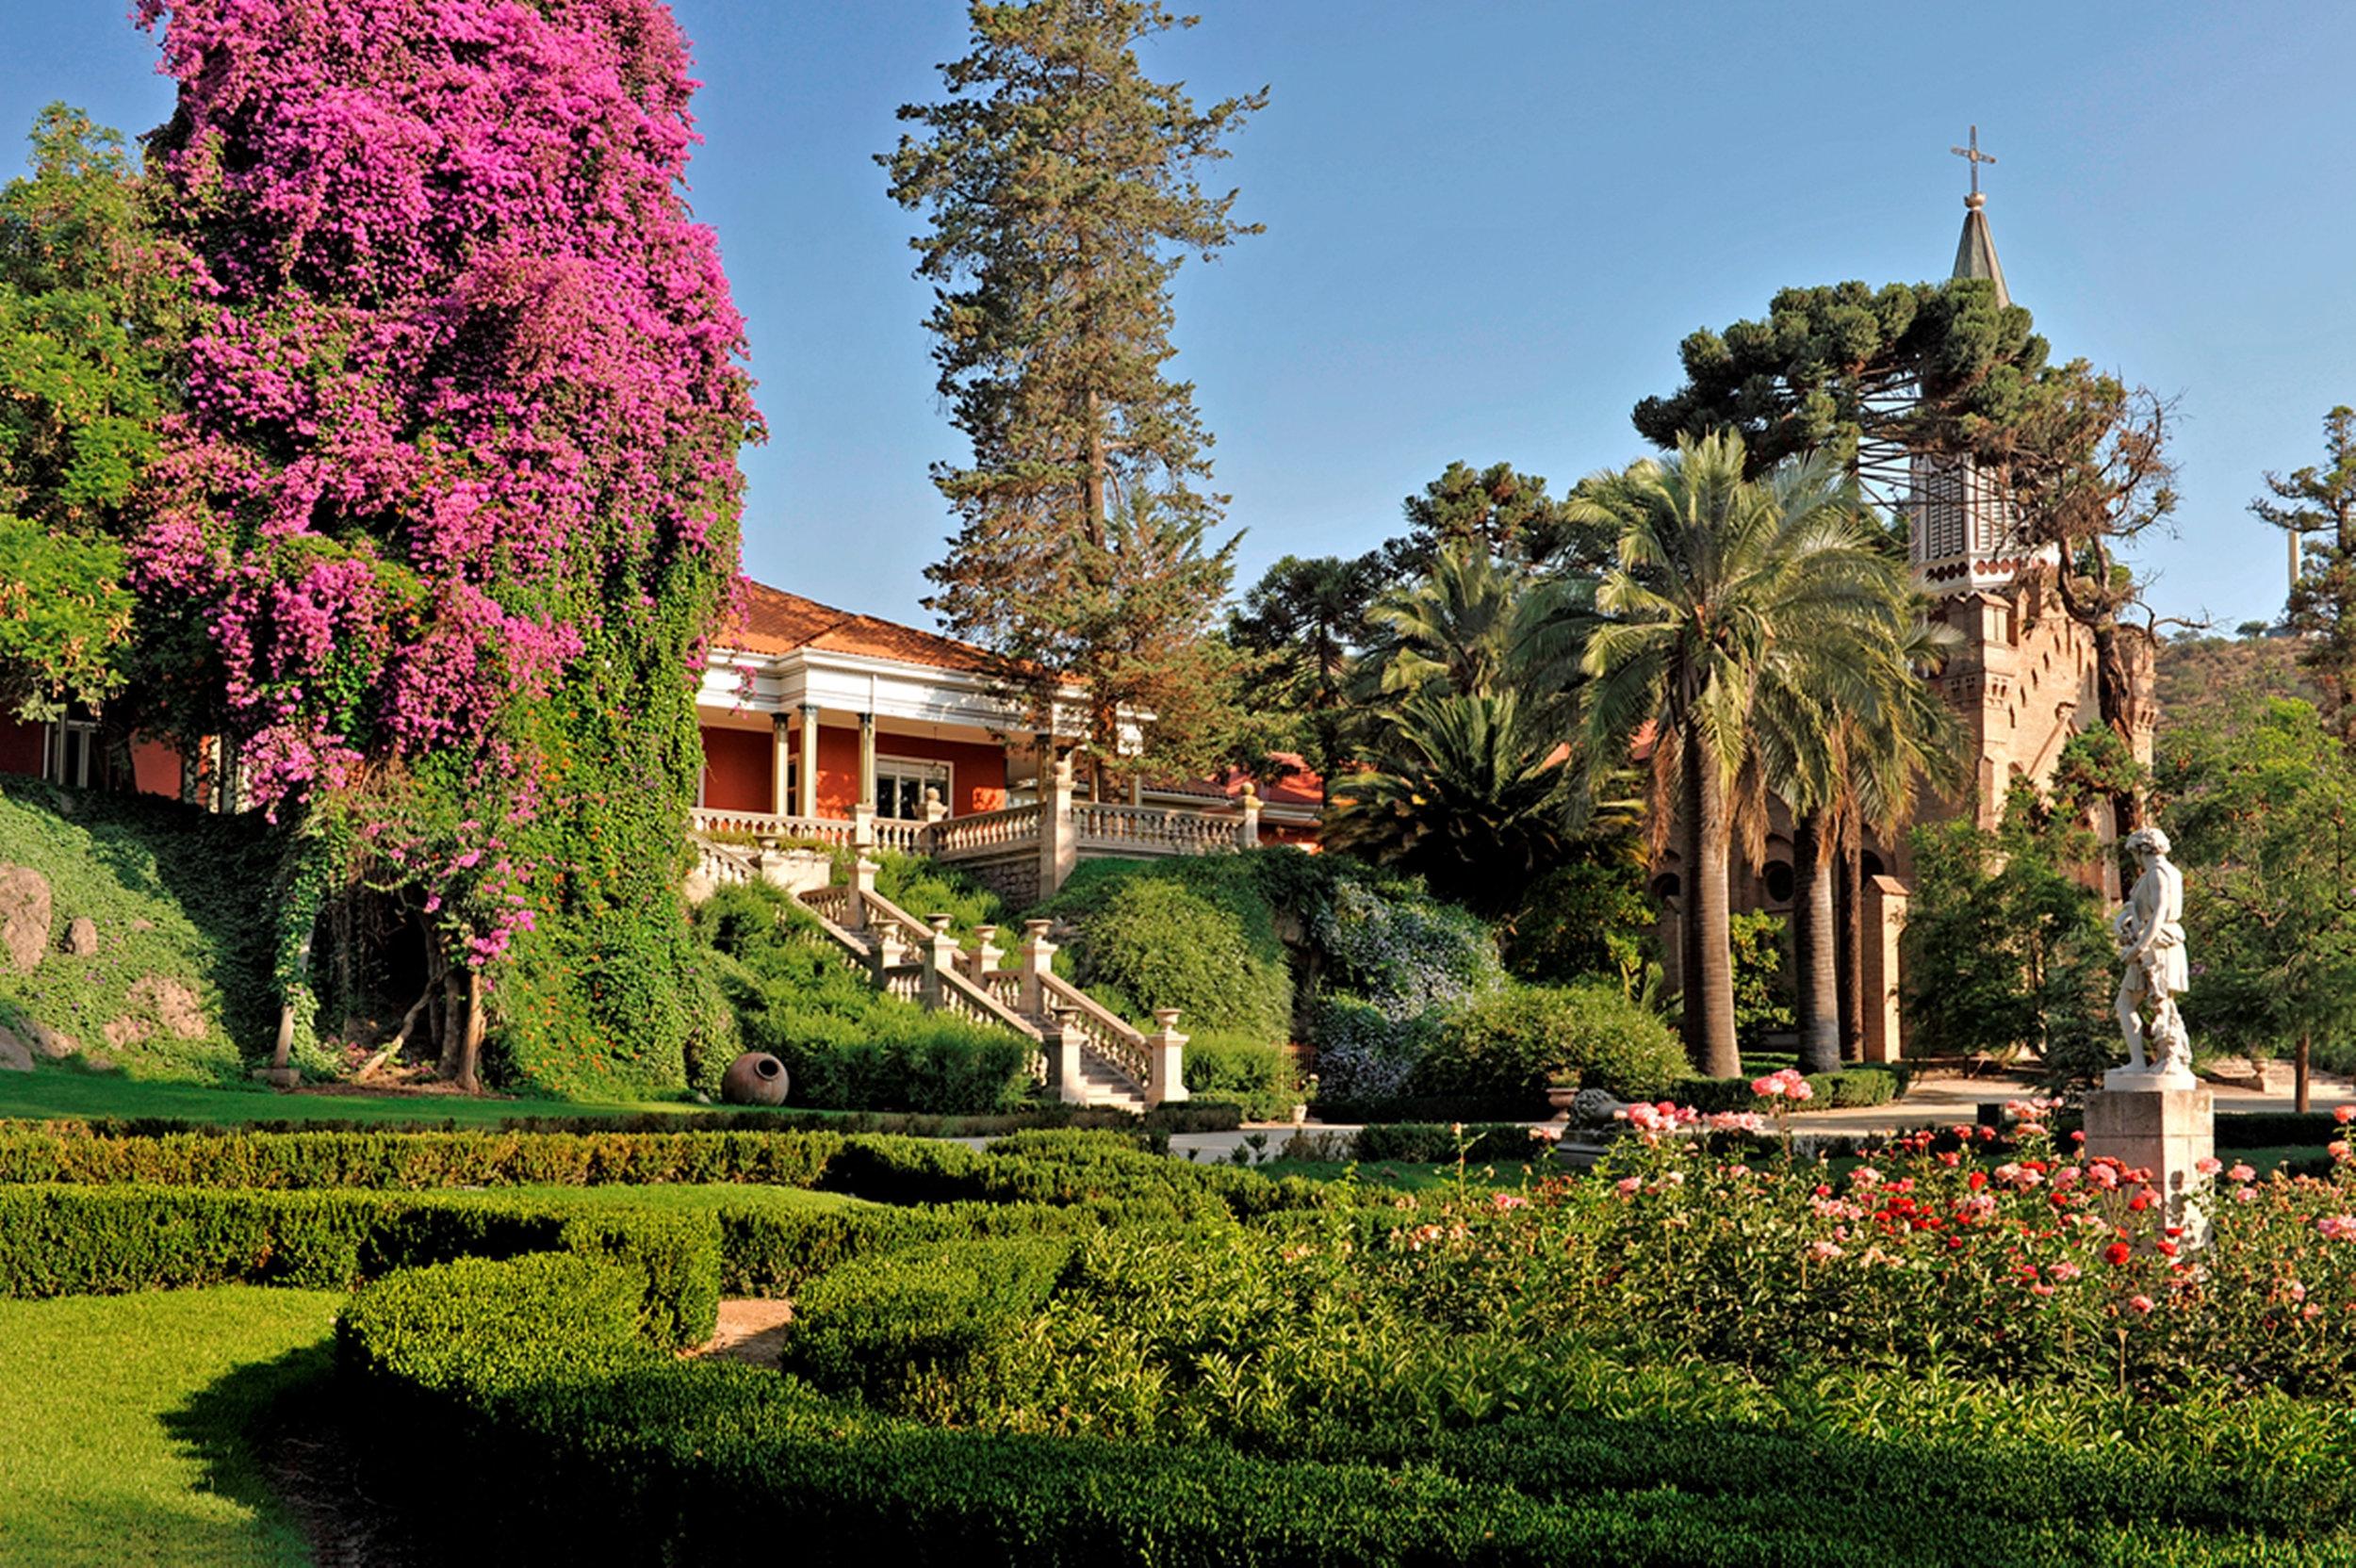 Copy of Casa Real.jpg